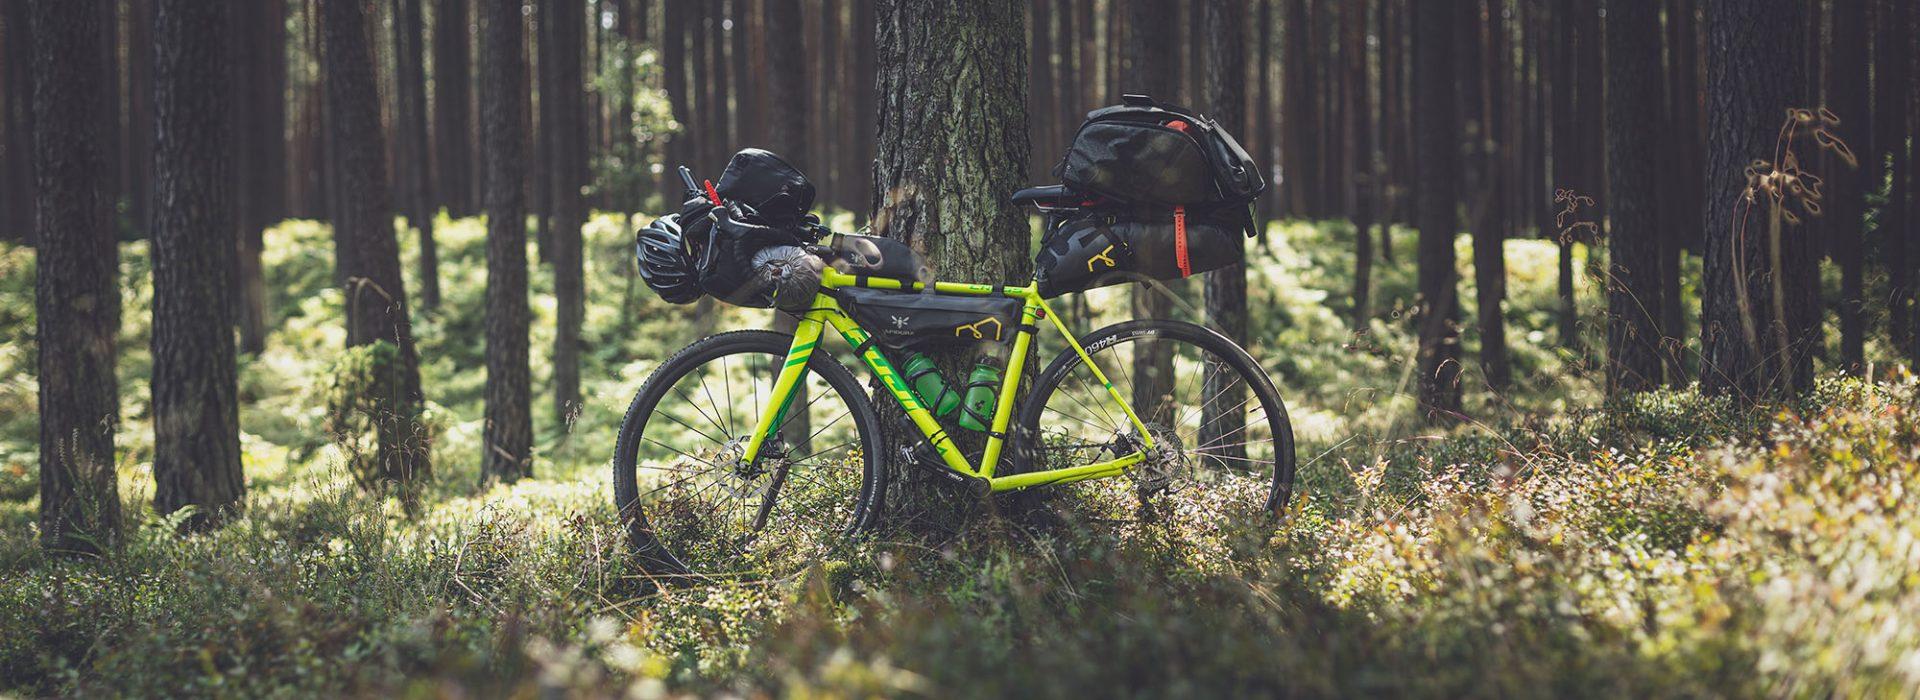 Spotzle, Gravel, Bikepacking, voyage à vélo,